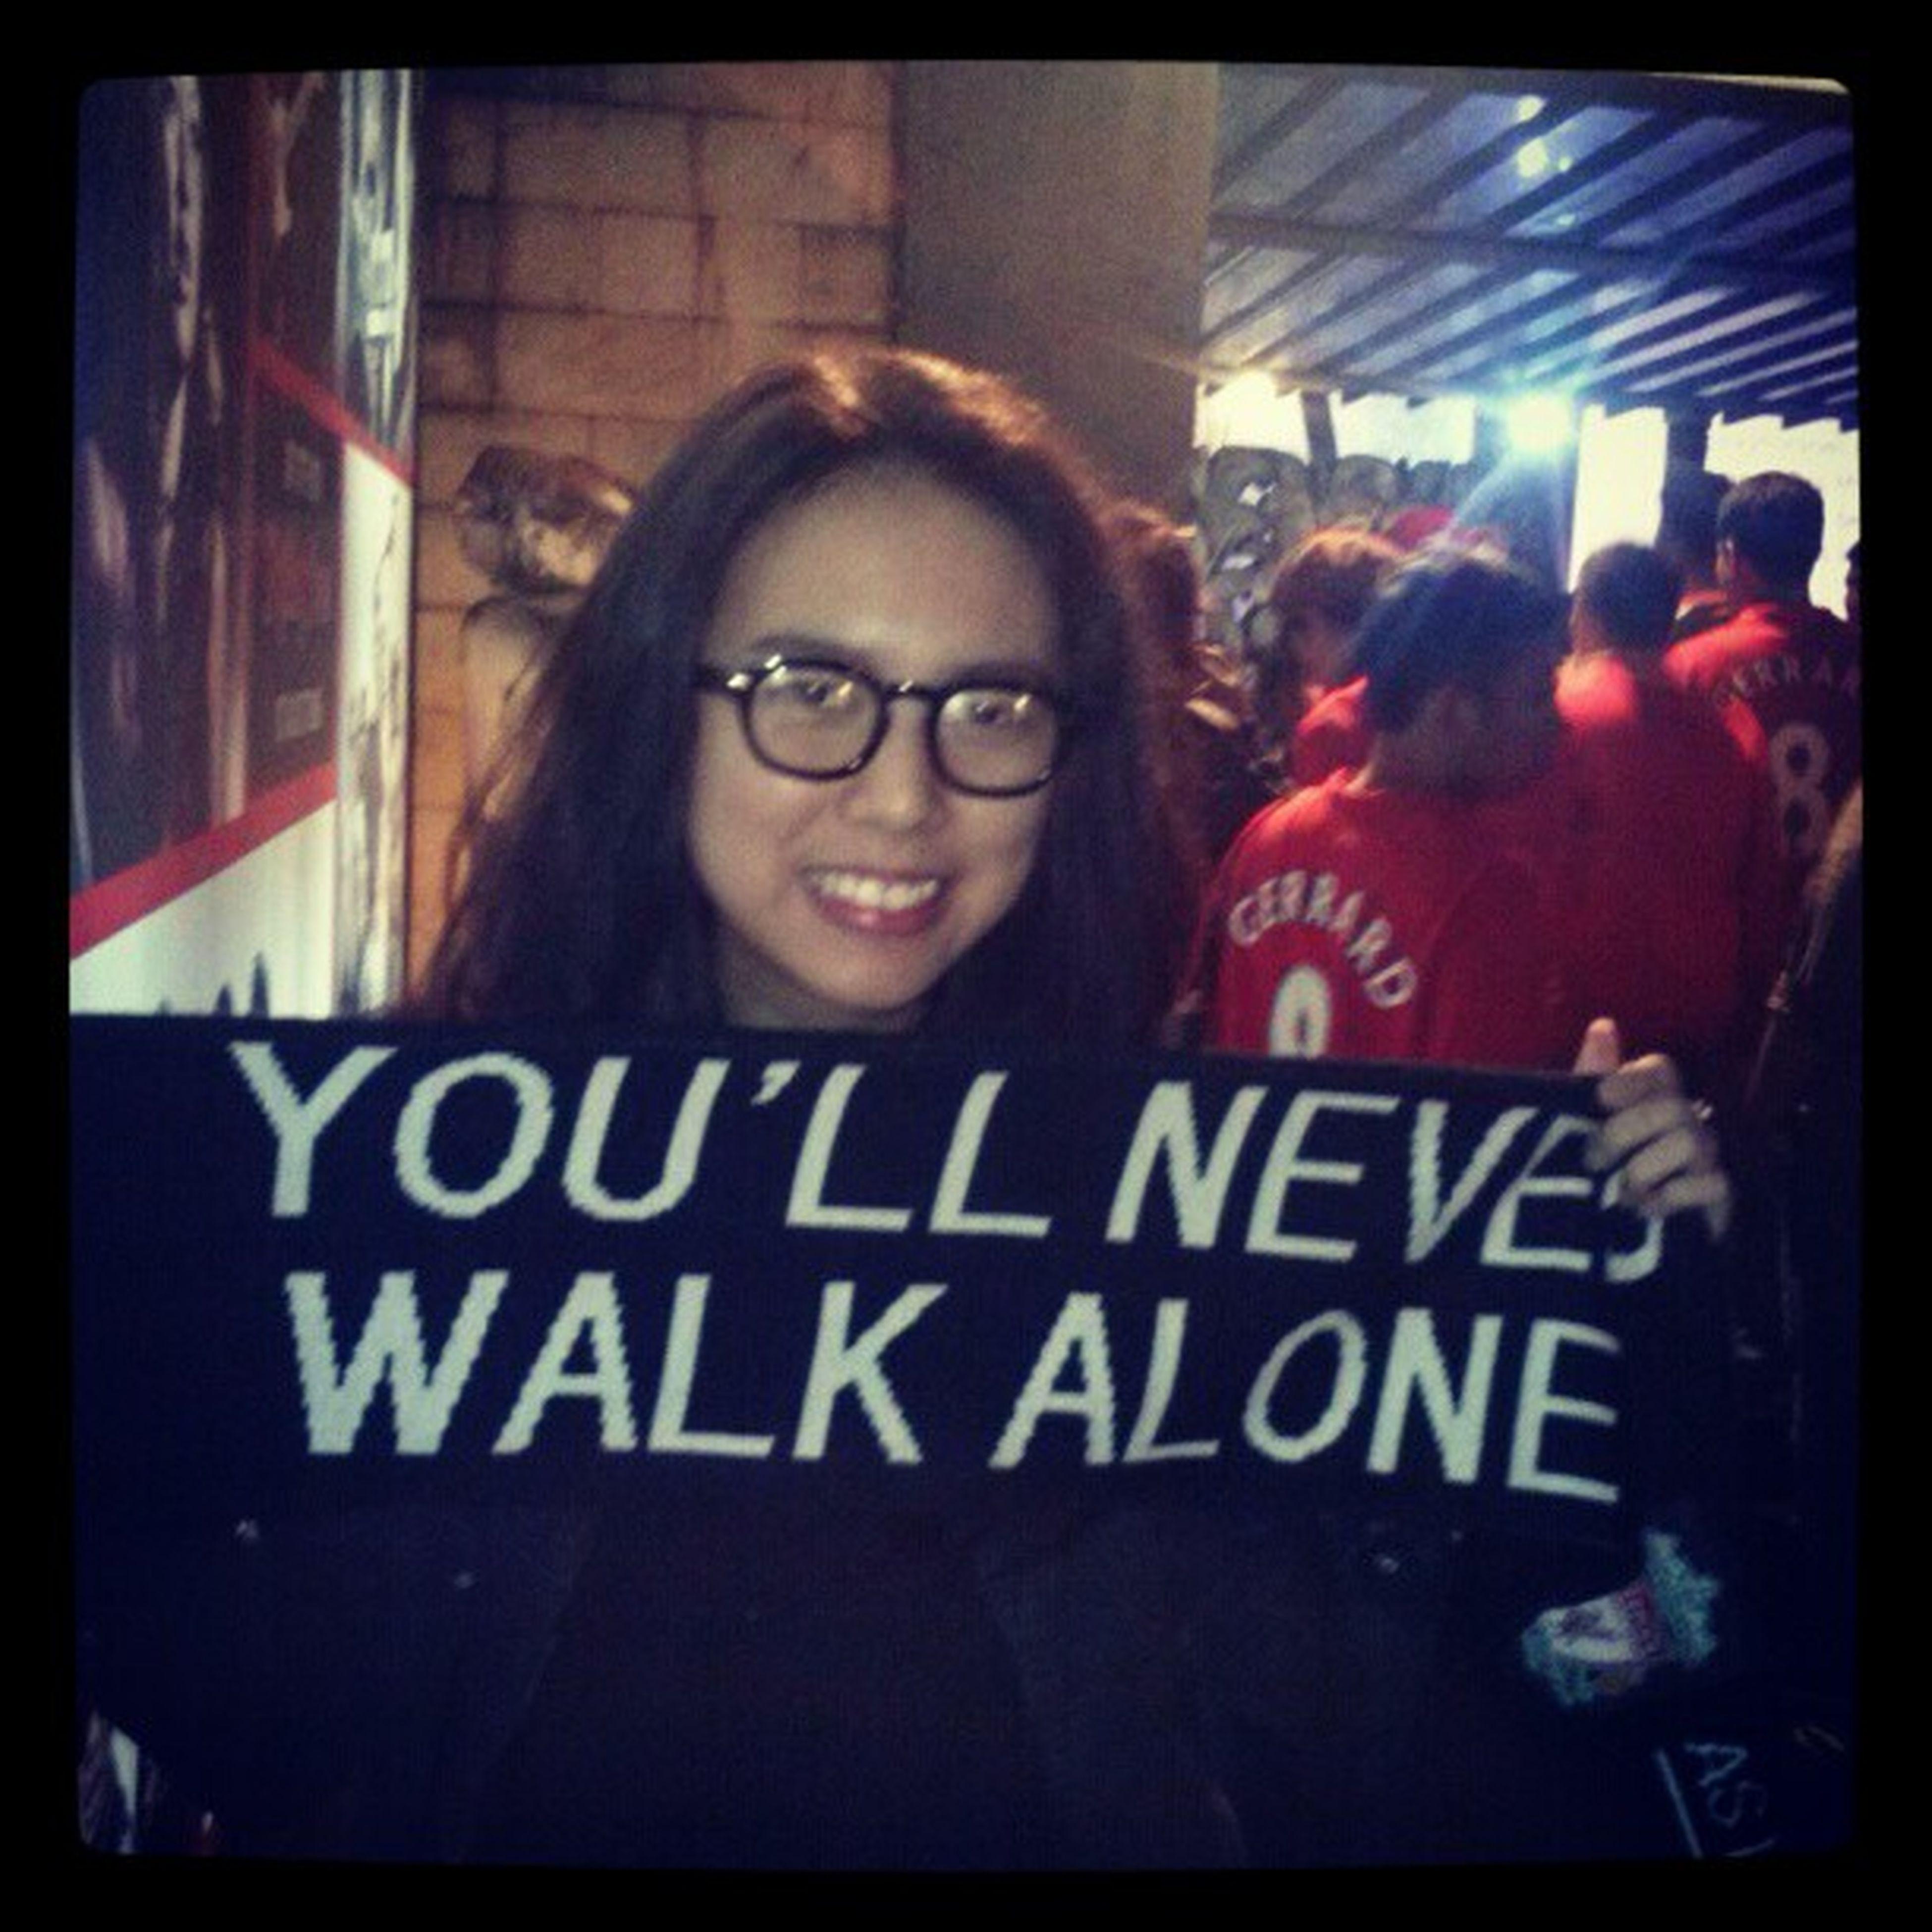 Thanks to @dellanyt , for accompanied me to watch LFC game YNWA Lfc cc @bigreds_iolsc